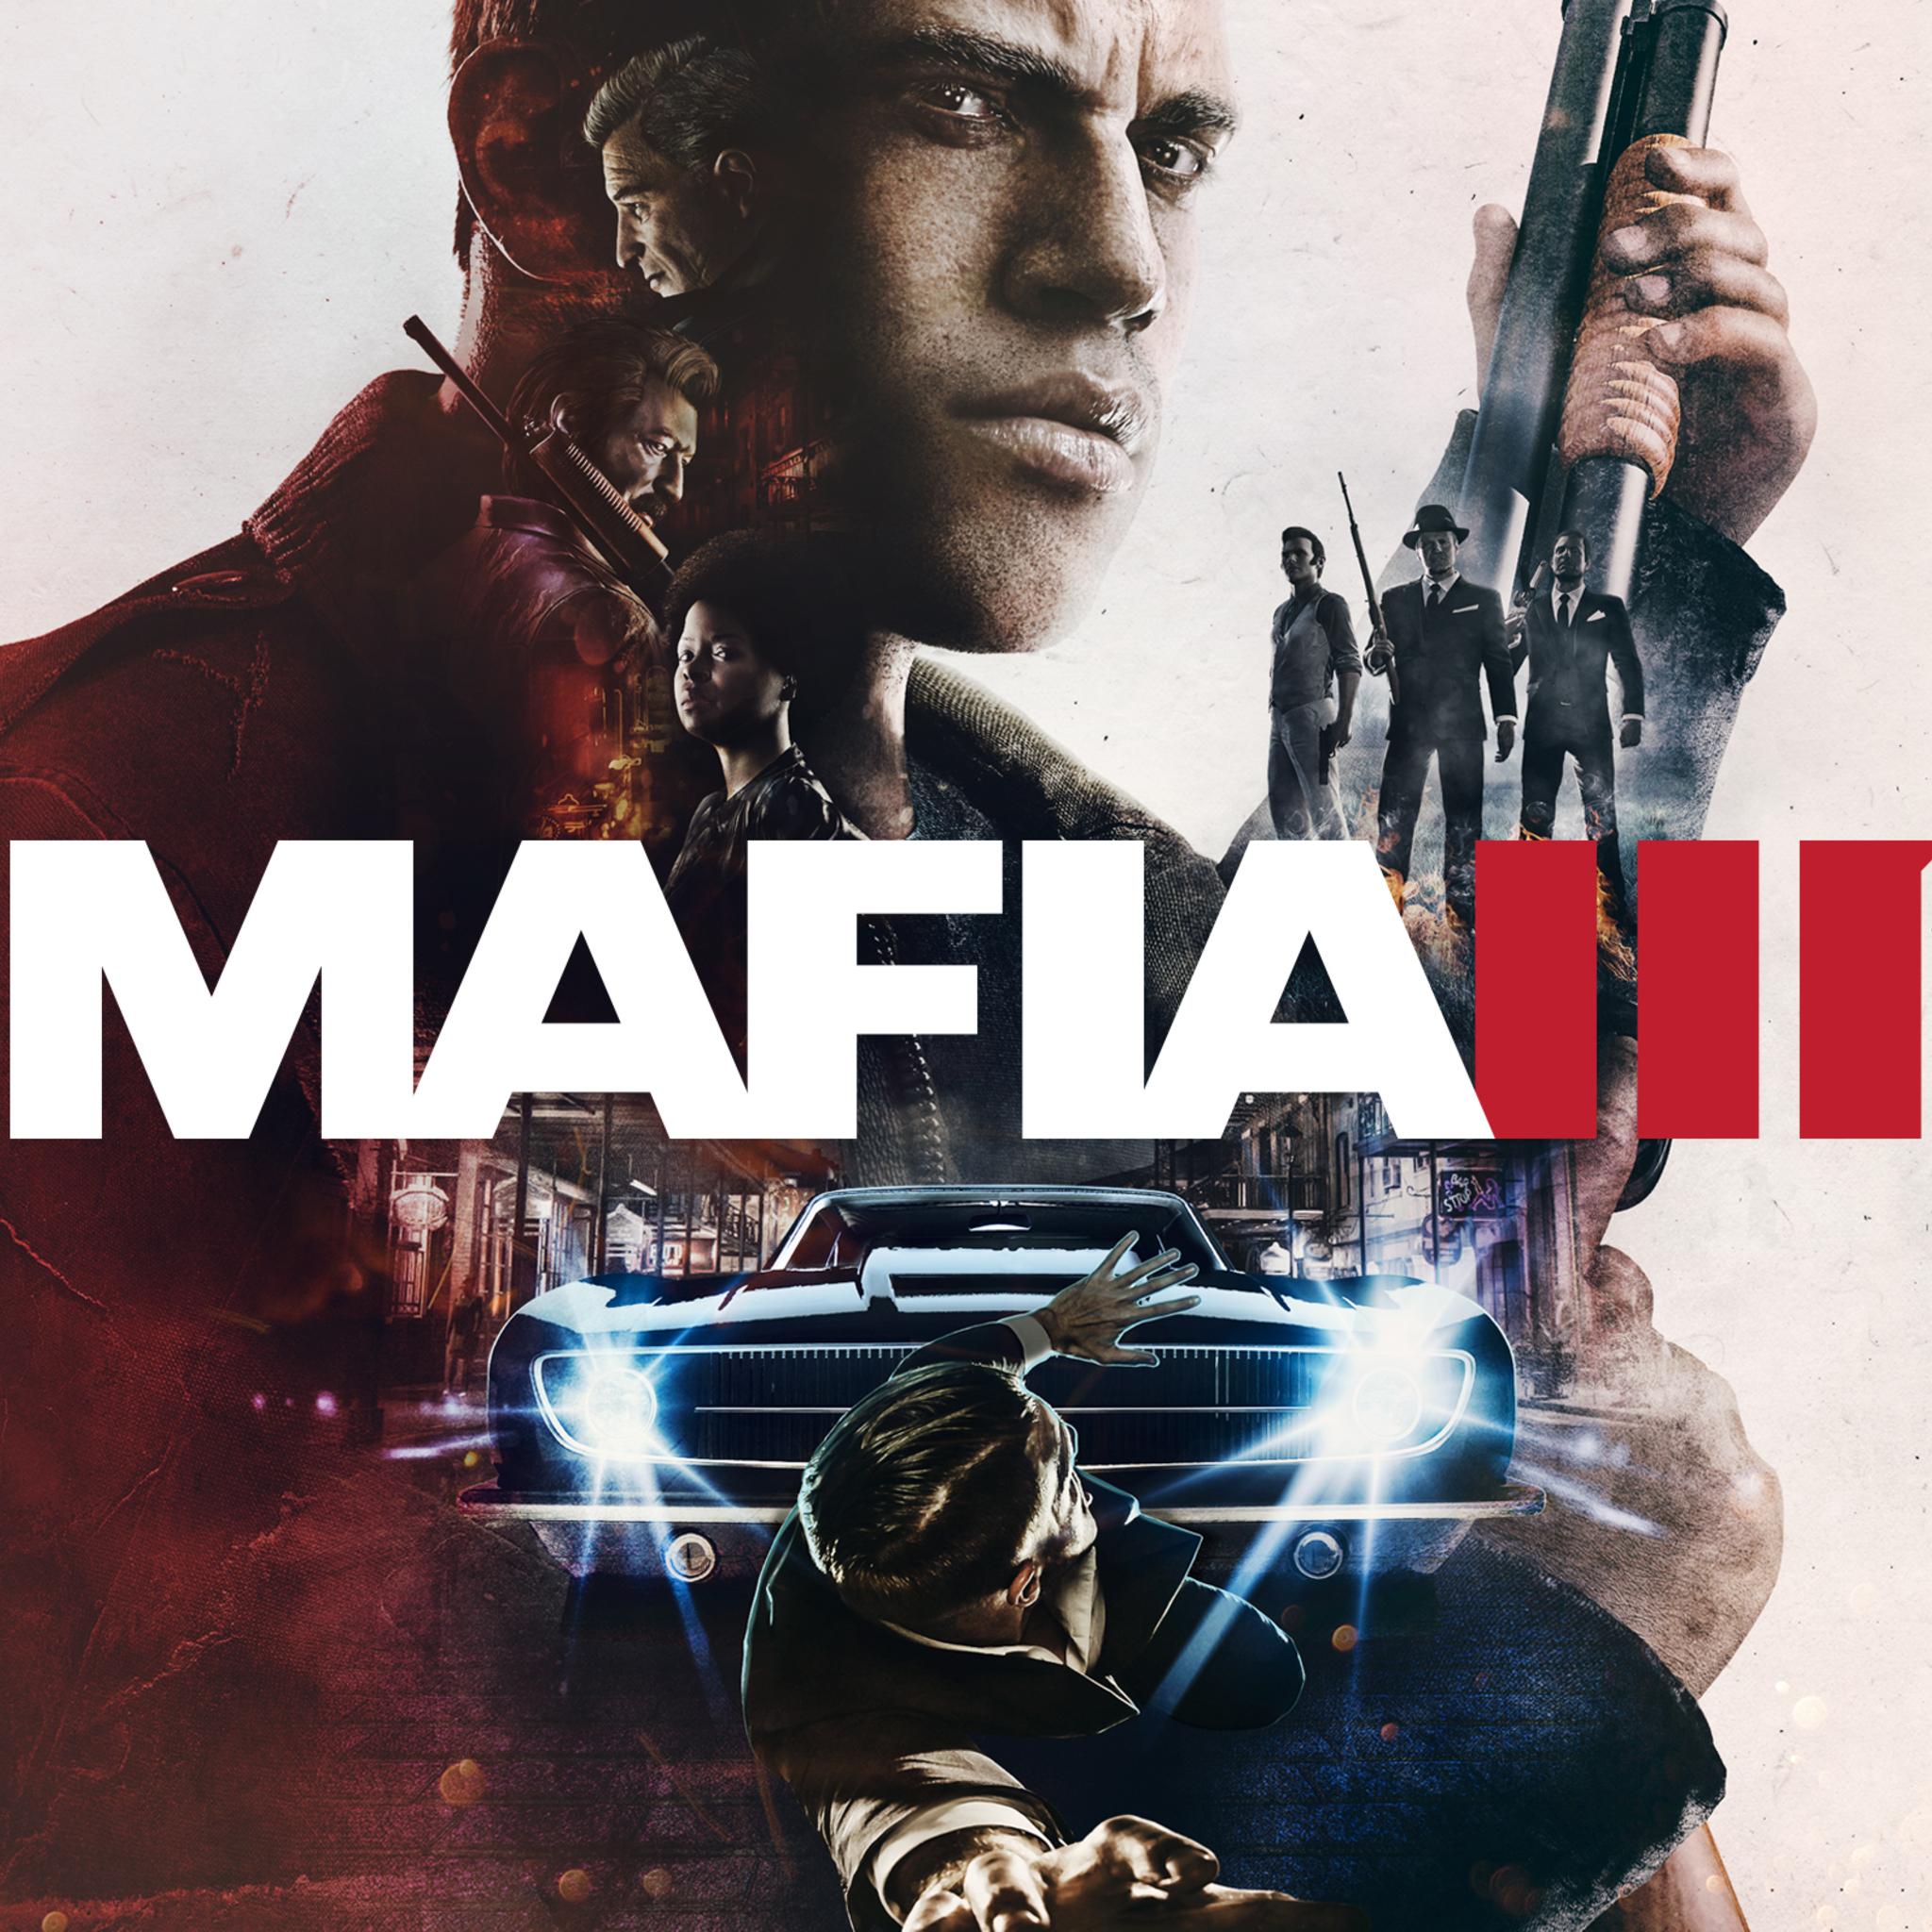 mafia-3-2016-game-image.jpg